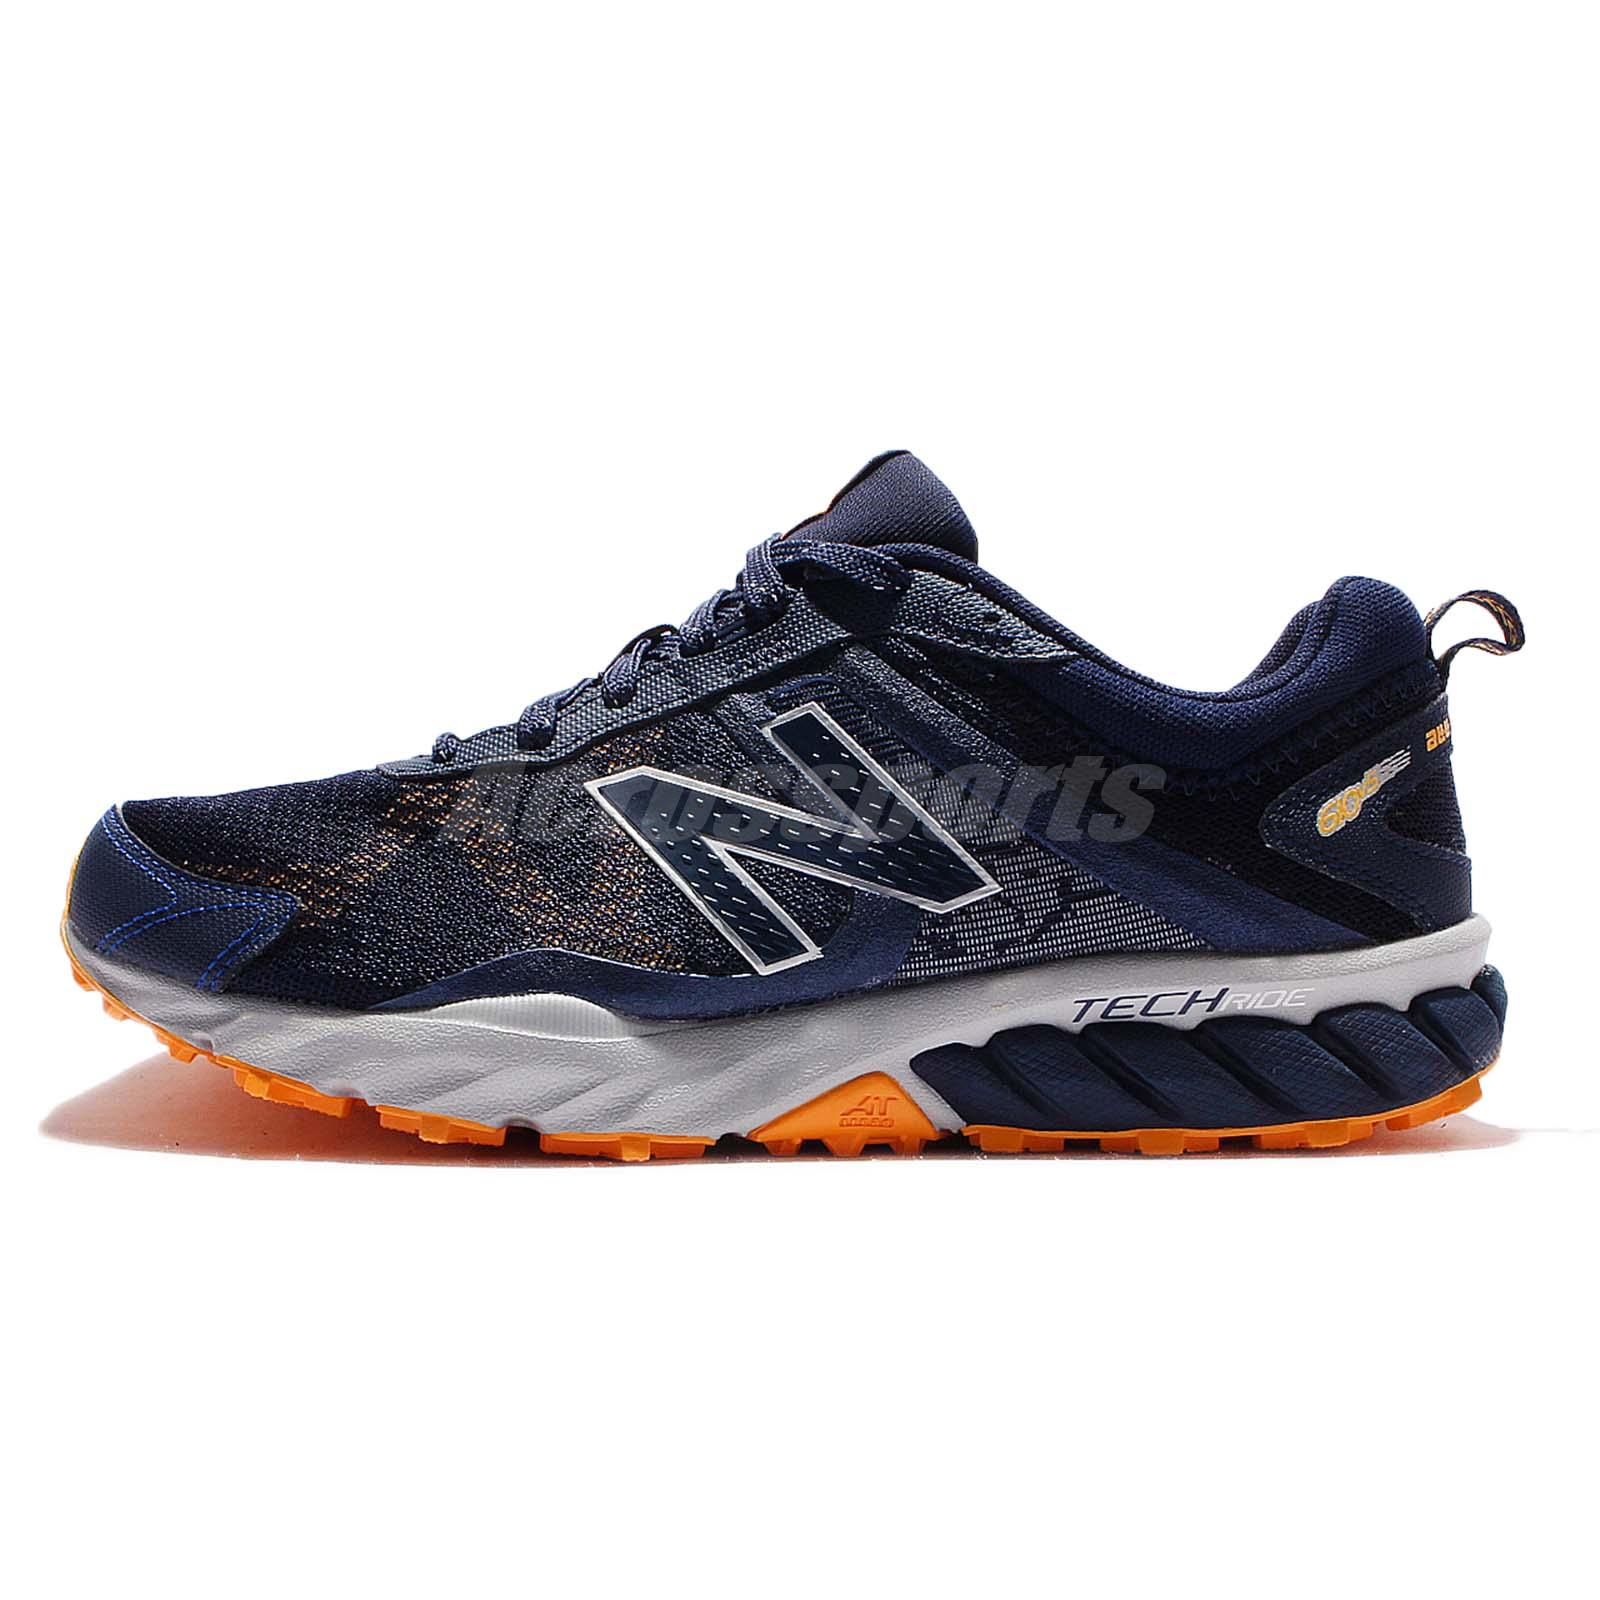 New Balance MT610RN5 2E Wide 610v5 Grey Navy Men Trail